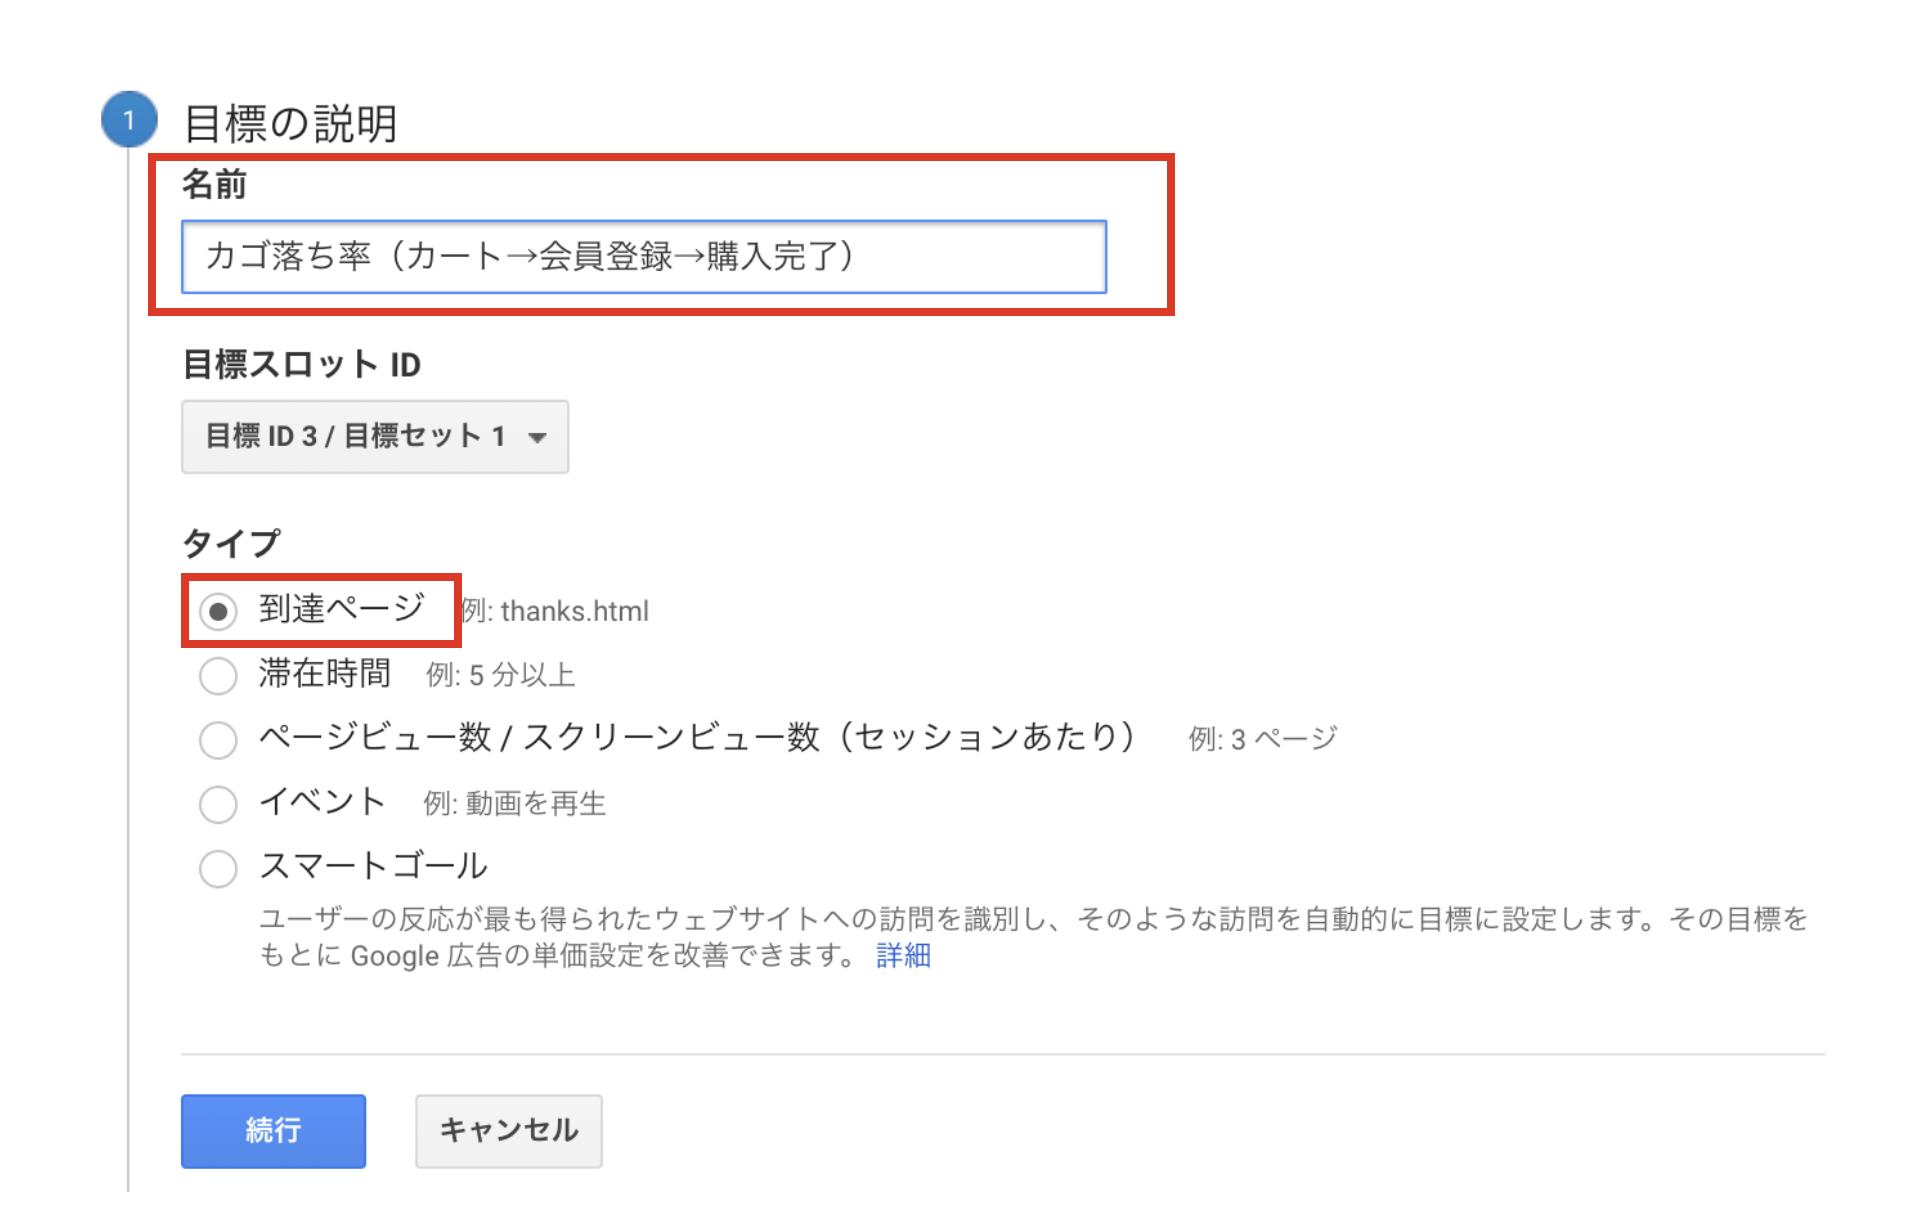 GoogleAnalyticsStep1